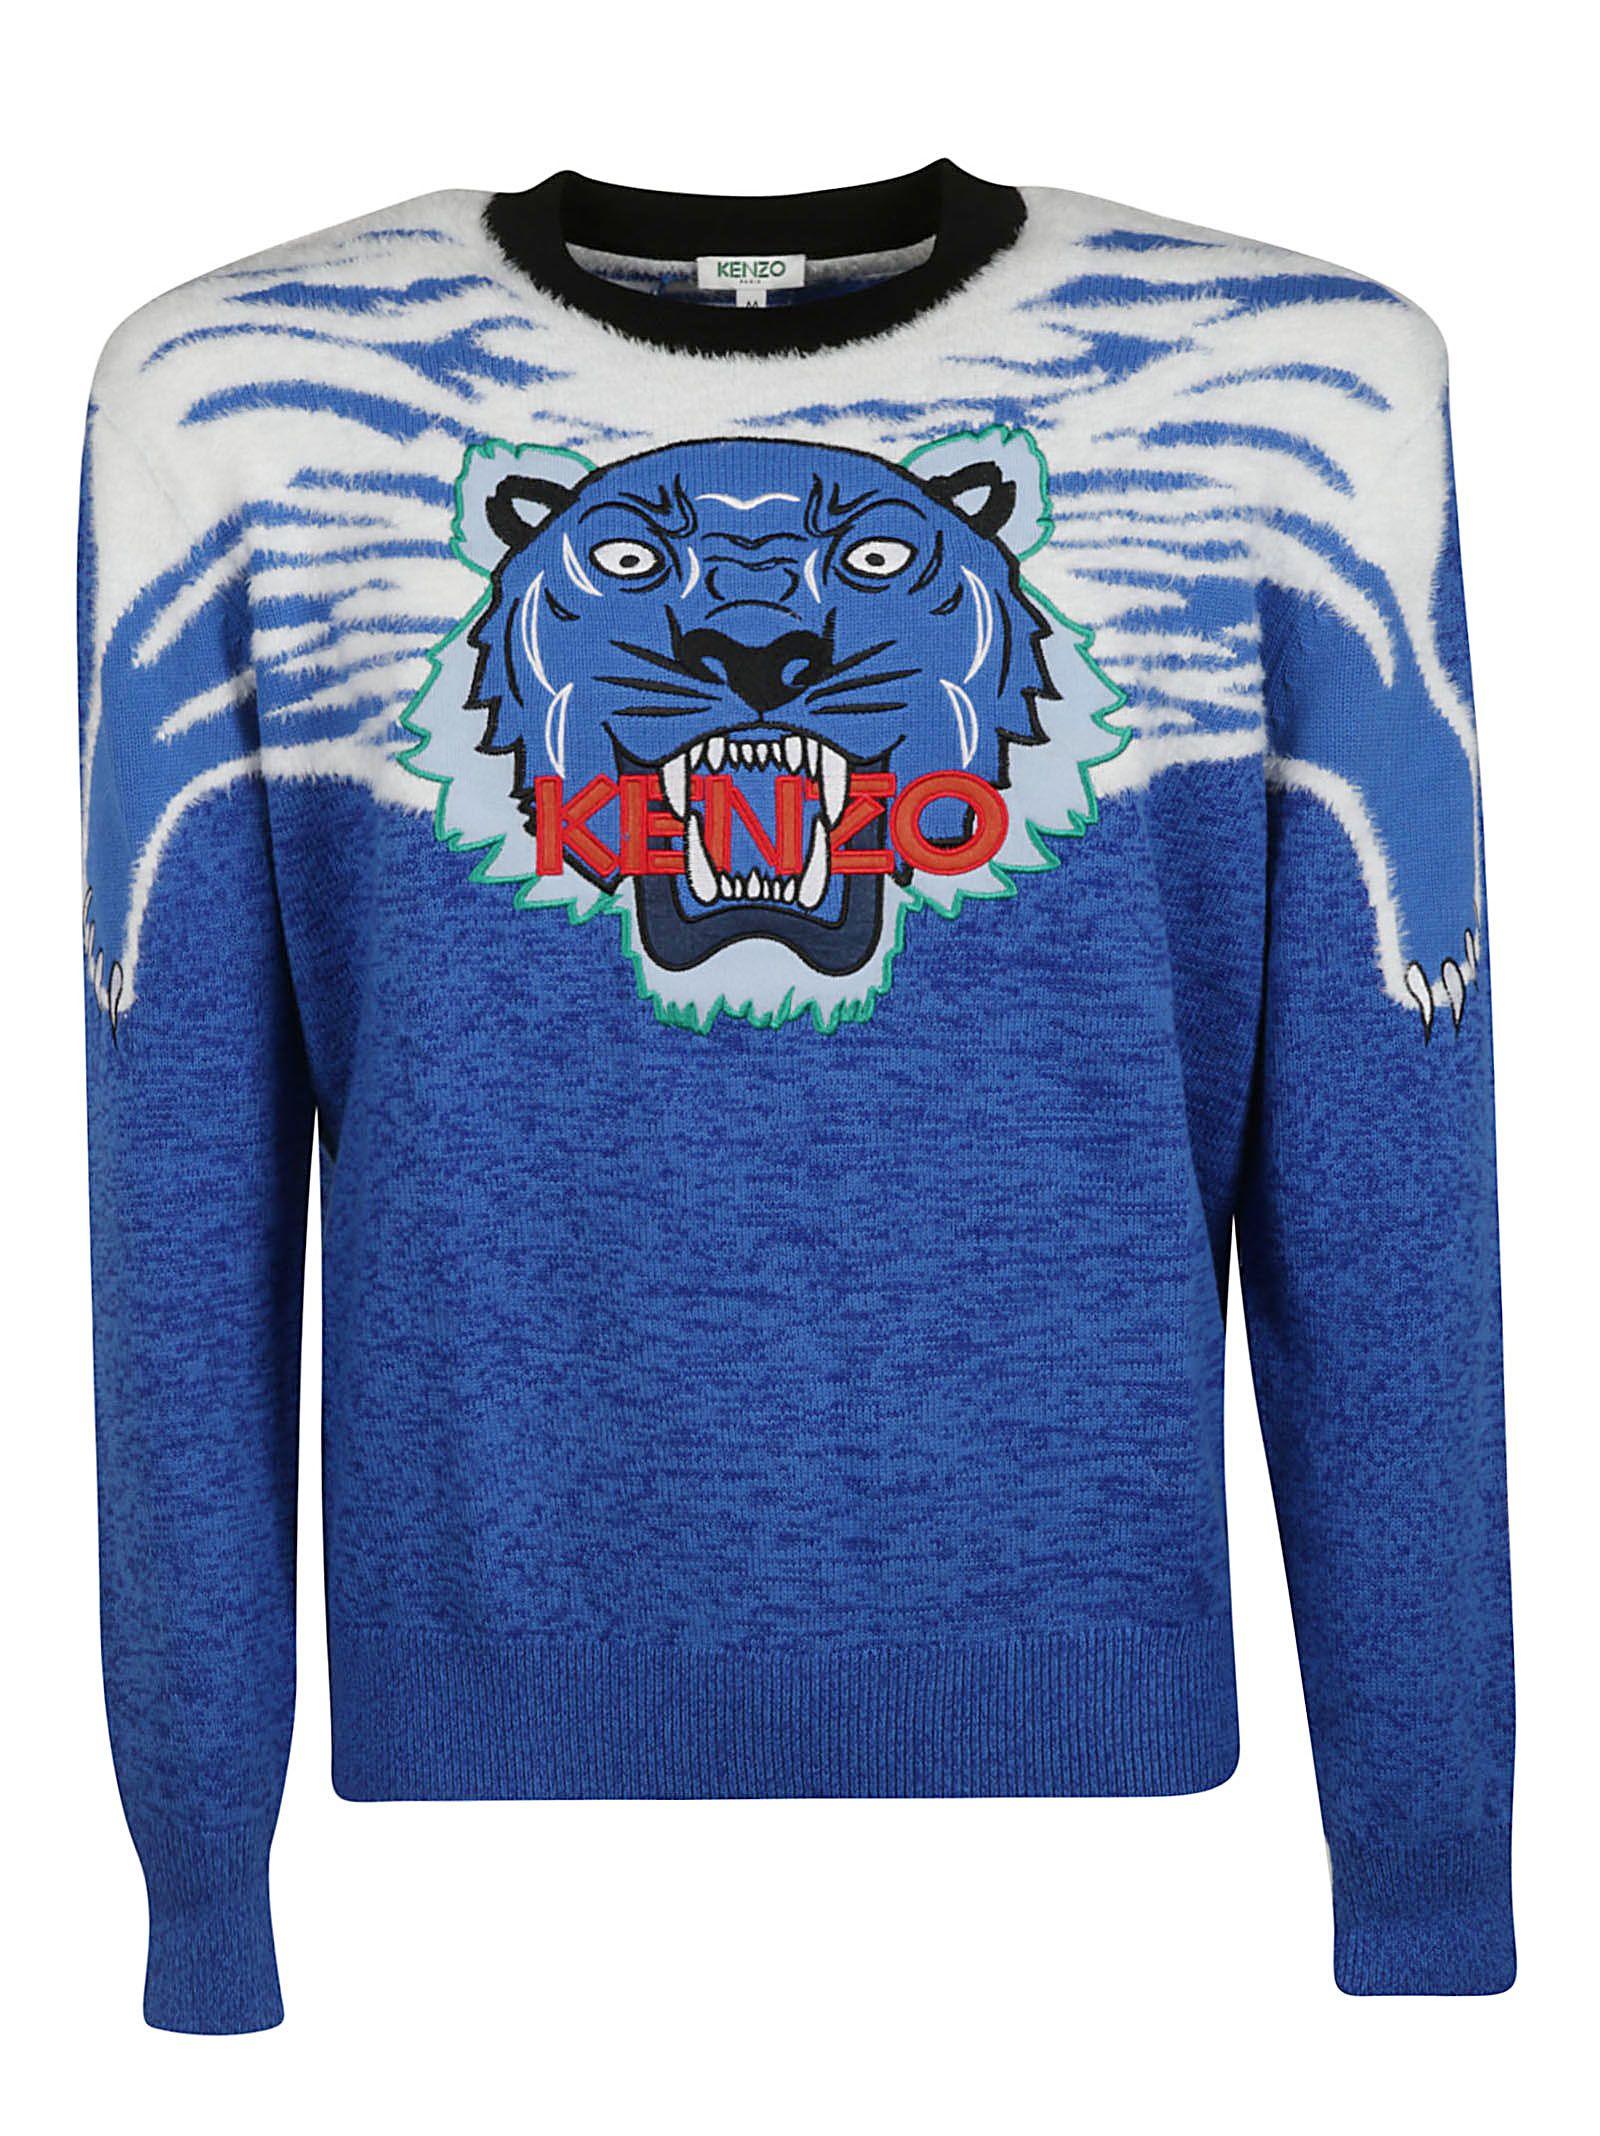 6d41e6c2fac689 Kenzo Kenzo Tiger Sweater - Bleu France - 10799710 | italist